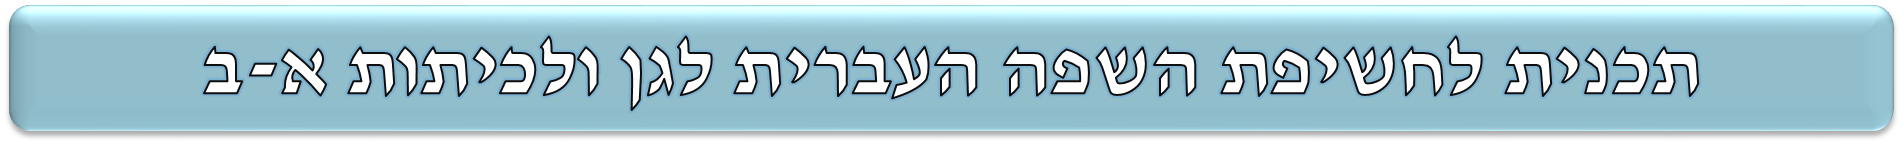 https://sites.google.com/a/arab.edu.gov.il/evriet/tymwt/tknyt-lhsypt-hsph-hbryt-lgn-wlkytwt--b